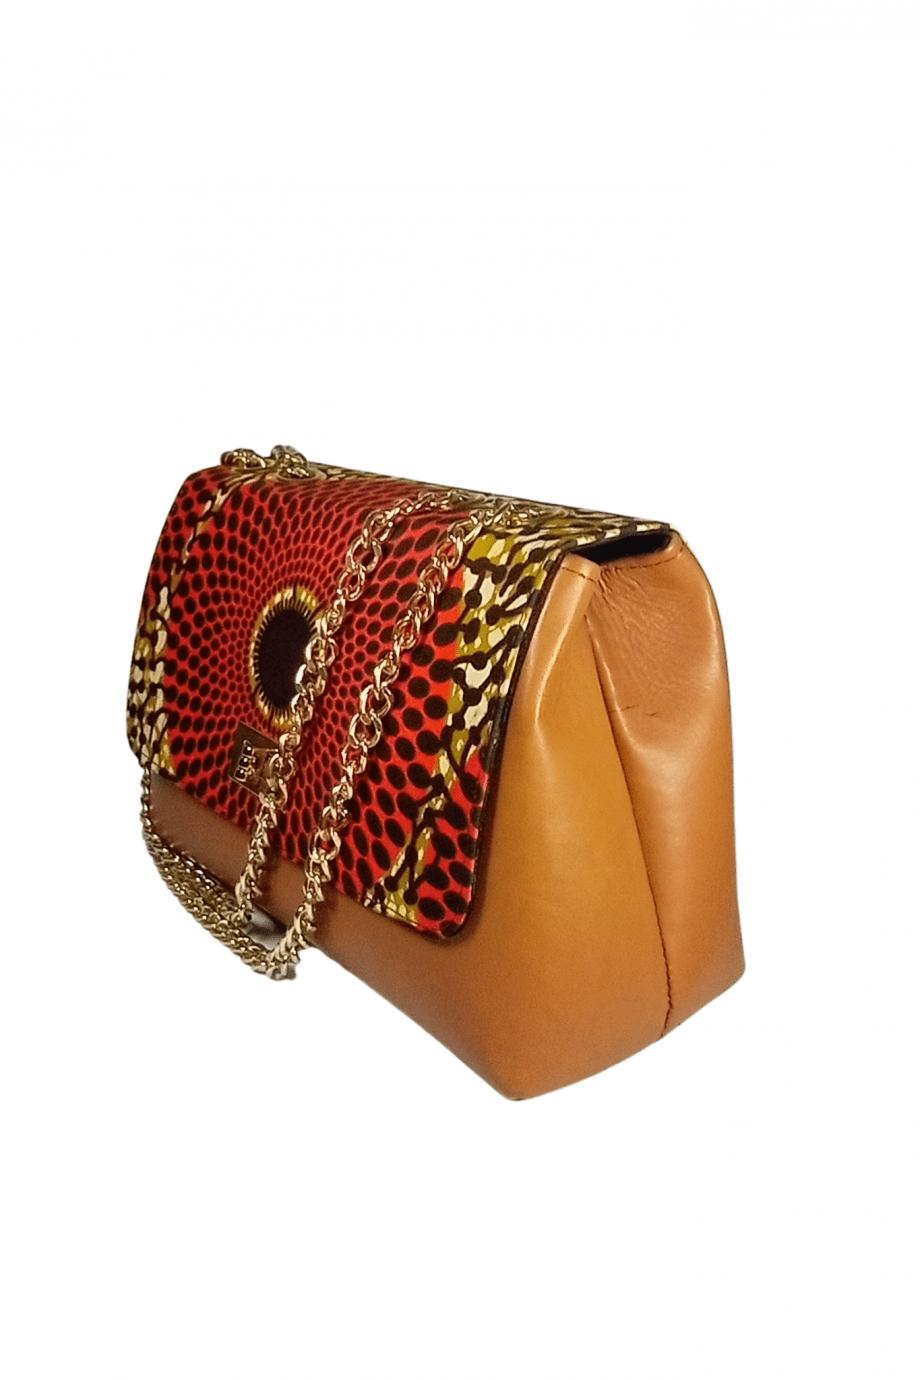 Brown Leather and Ankara Bag JOLASUN by Naborhi